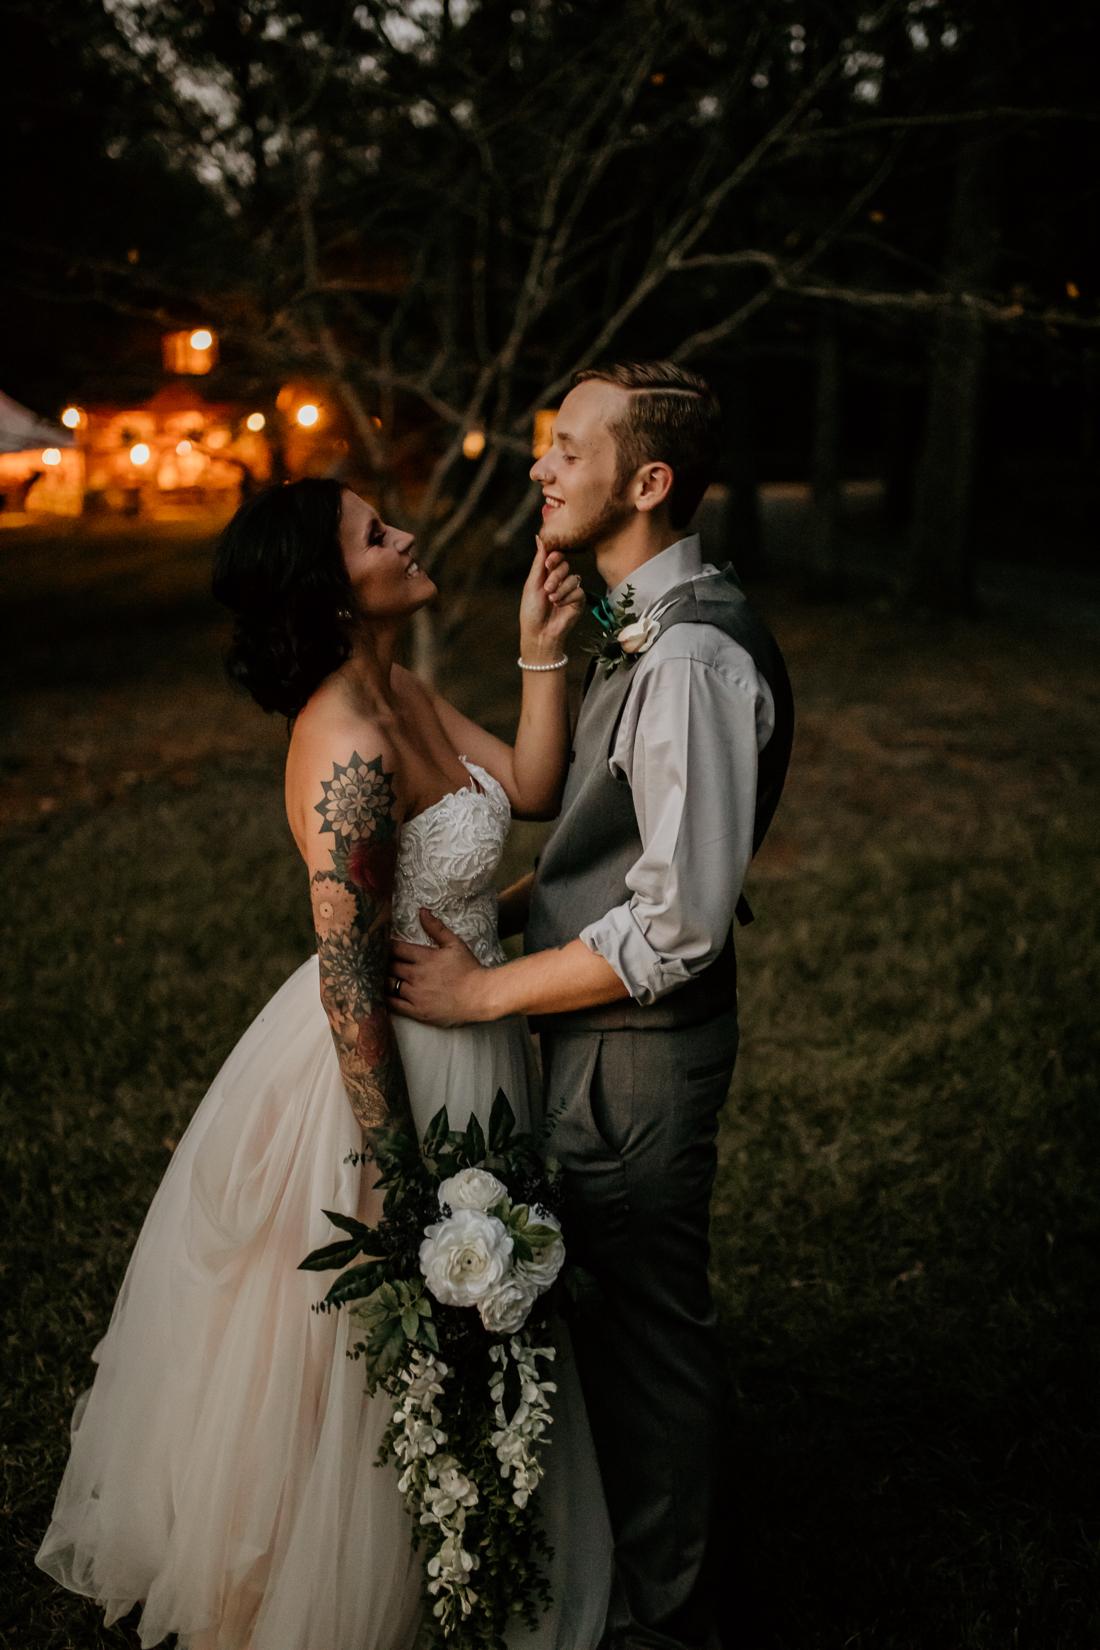 olivia_zay_wedding_09_2018-8870.jpg